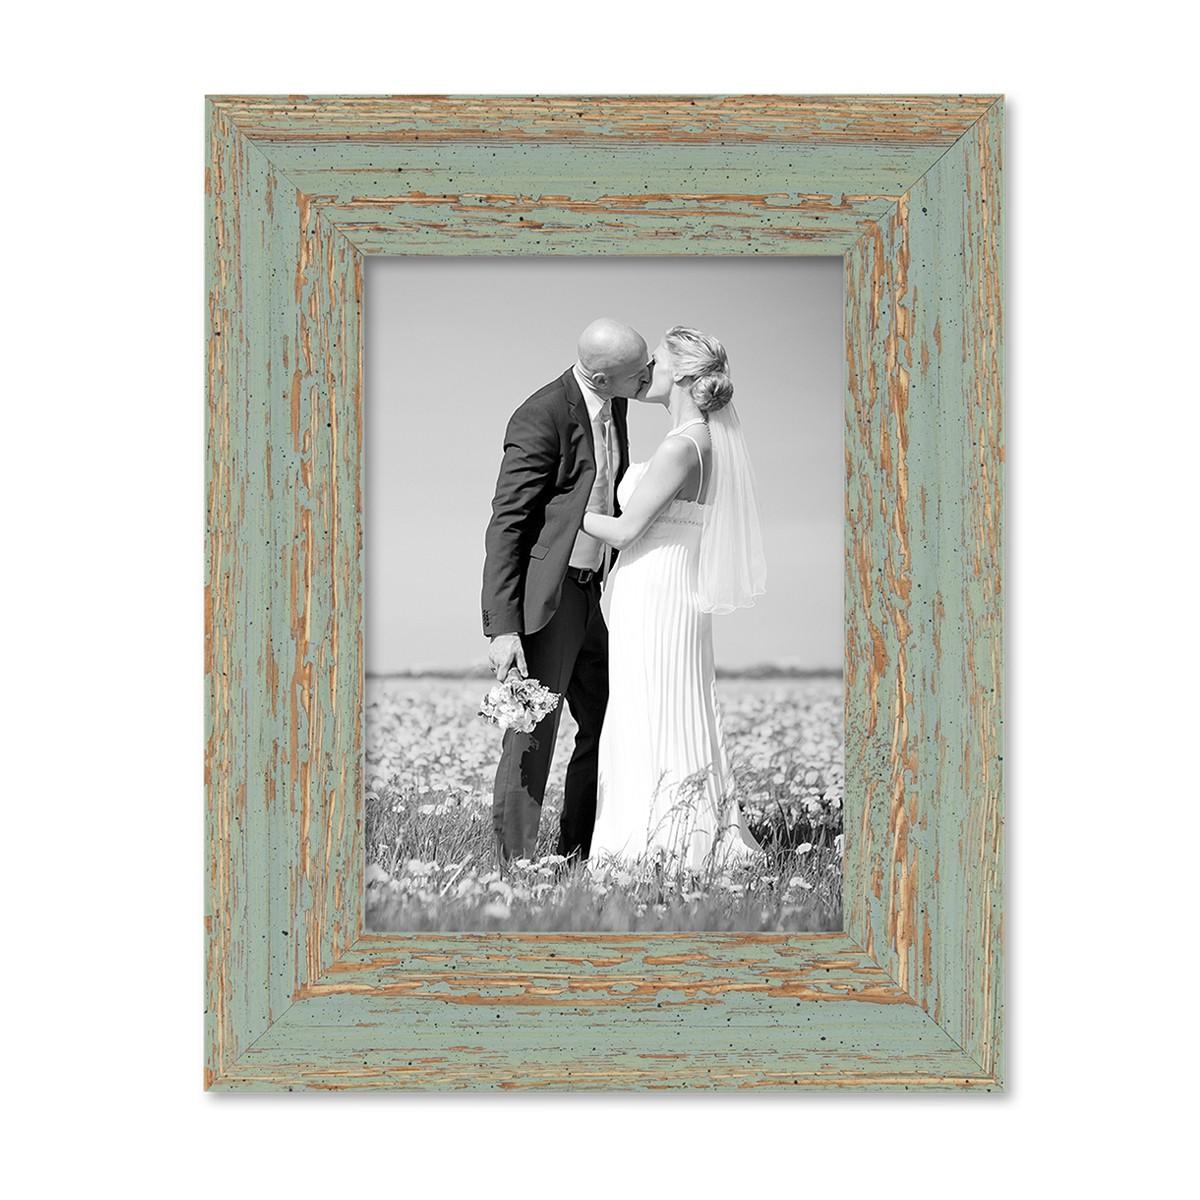 3er set vintage bilderrahmen 13x18 cm graugrün shabby